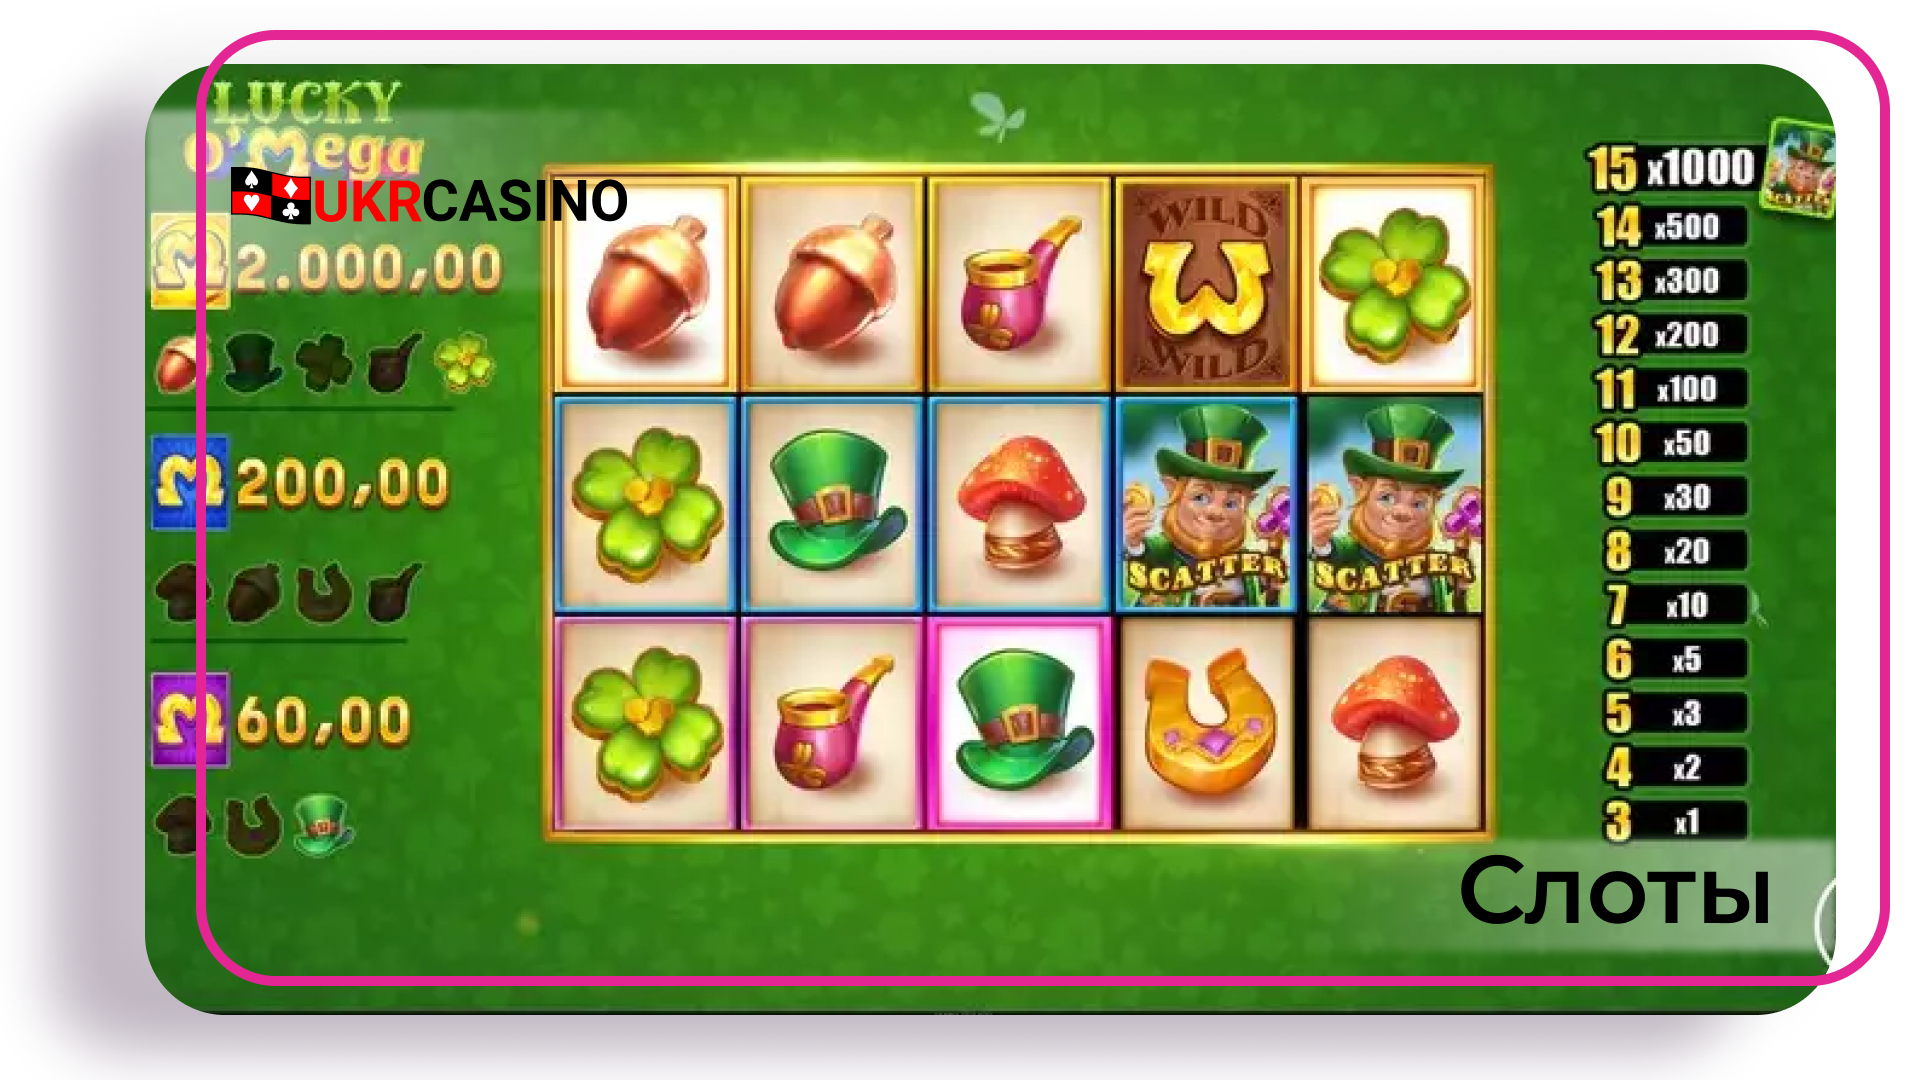 Lucky O'Mega - Gong Gaming Technologies